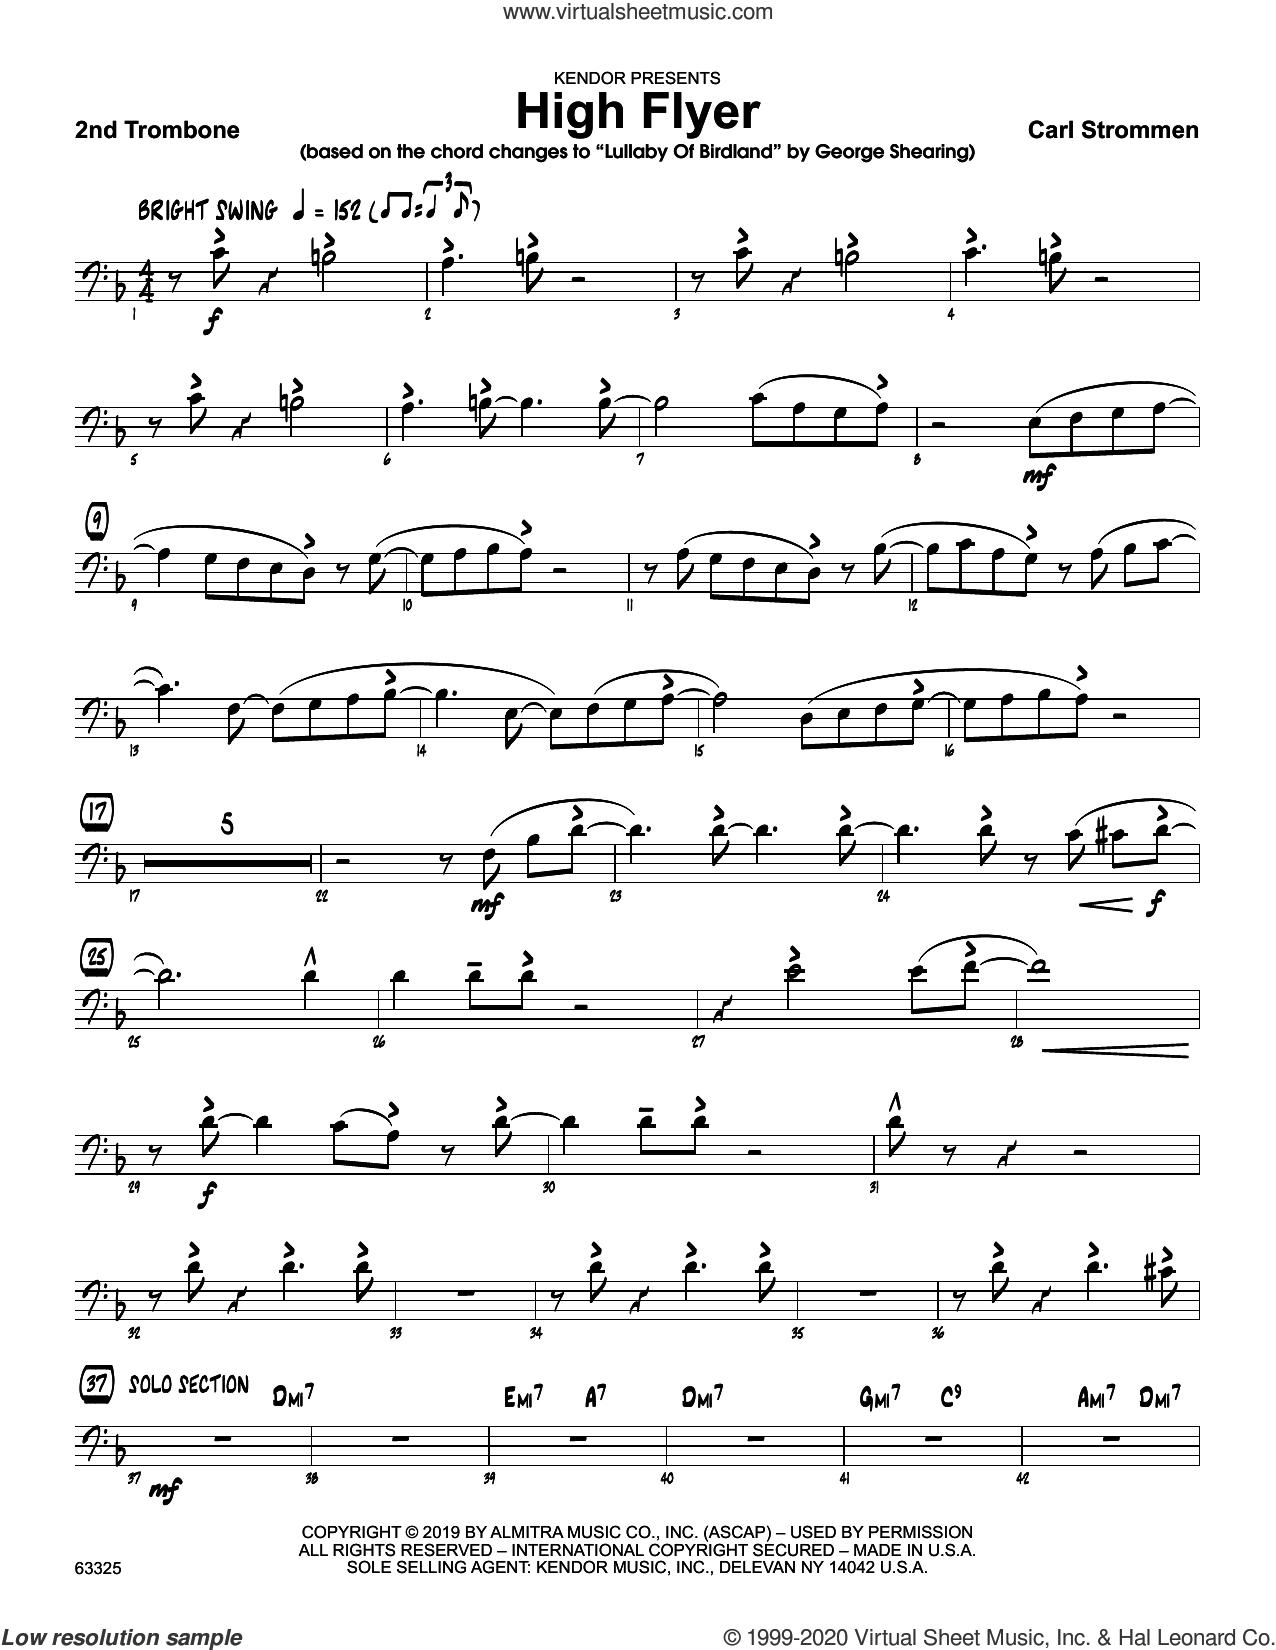 High Flyer sheet music for jazz band (2nd trombone) by Carl Strommen, intermediate skill level